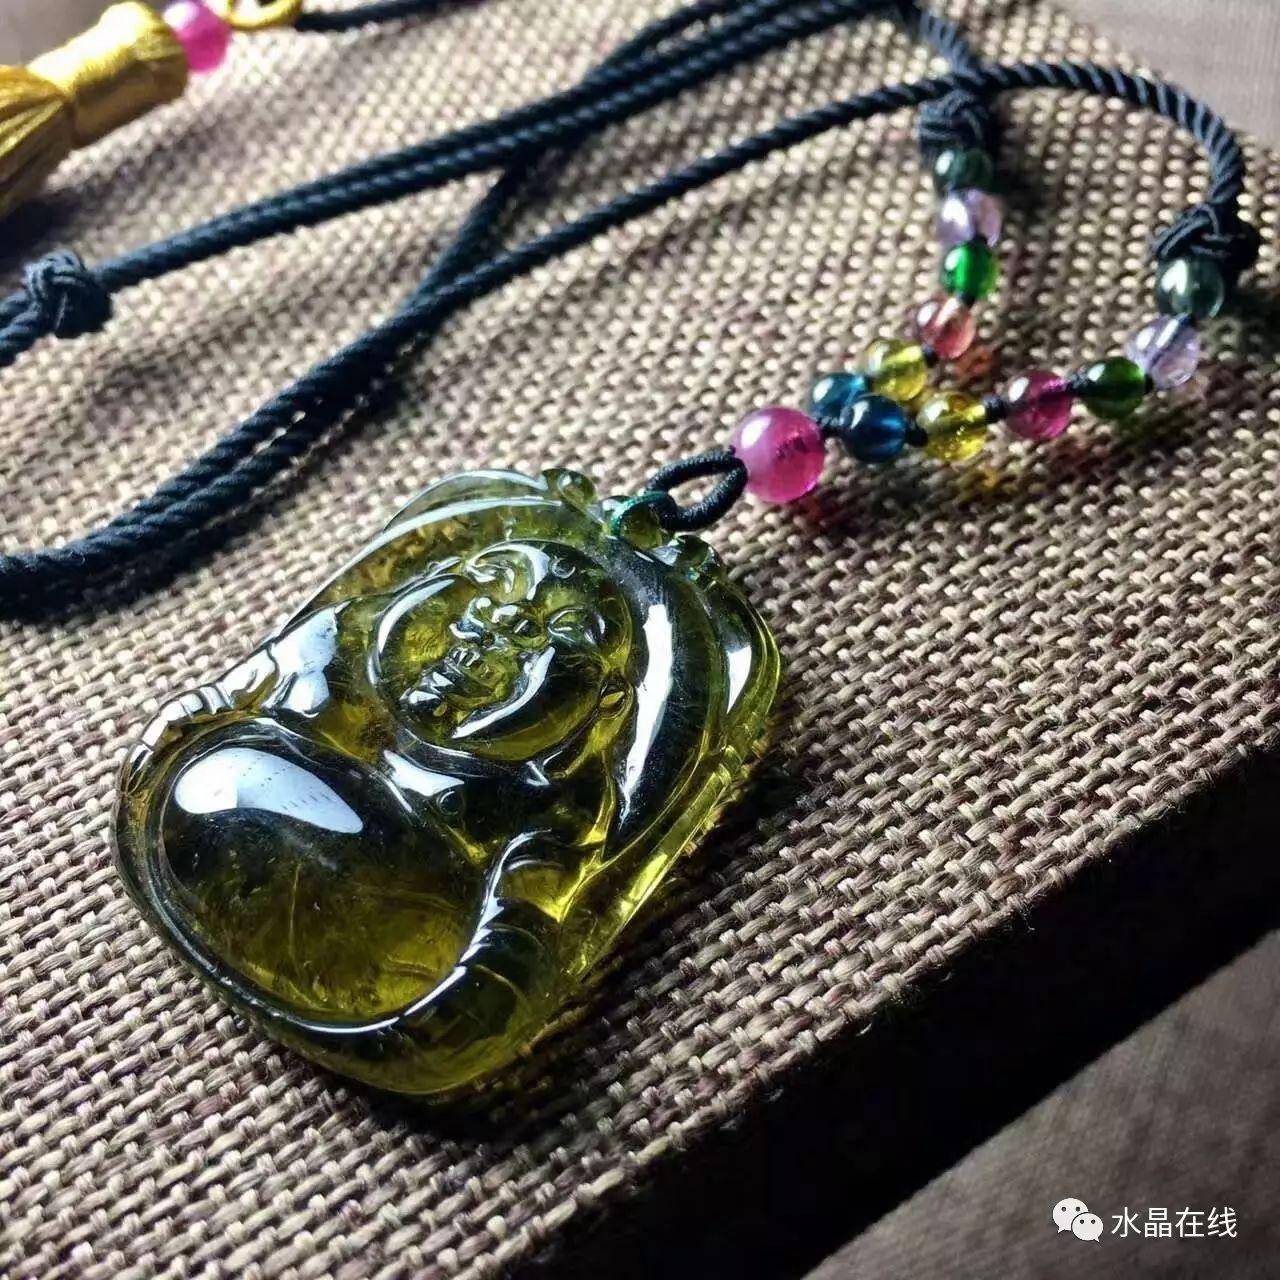 resize,m fill,h 1280,w 1280 - 七夕情人节送什么礼物好呢?我推荐选一件水晶送女朋友!